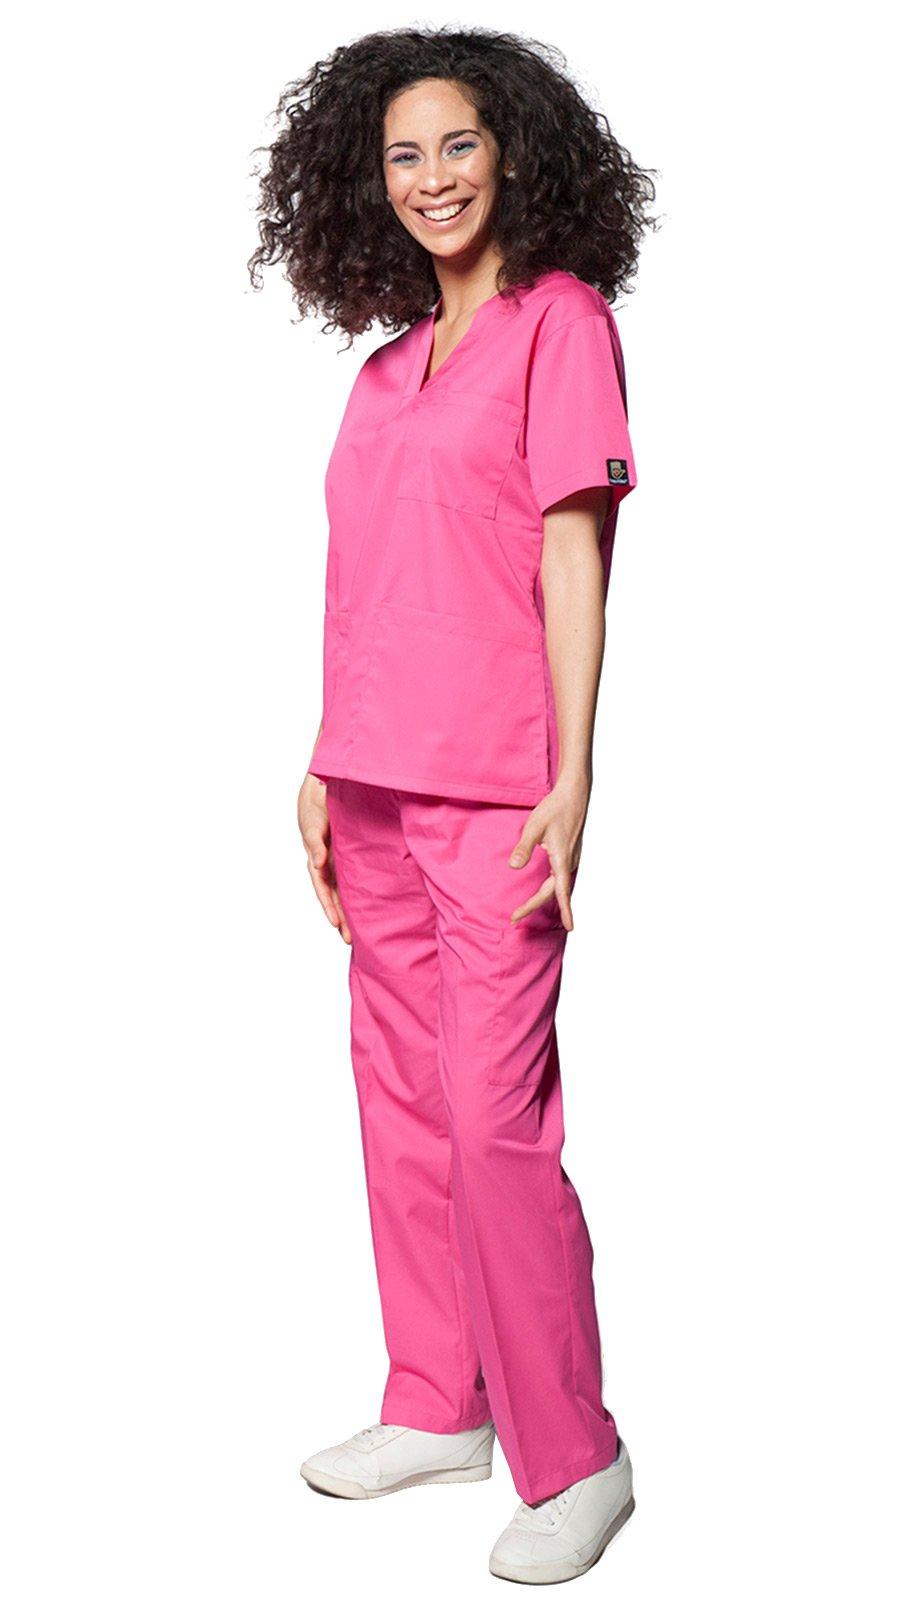 Dress A Med Classic 7 Pocket Basic V-Neck Uniform Scrubs 2 Piece Set Top & Pants